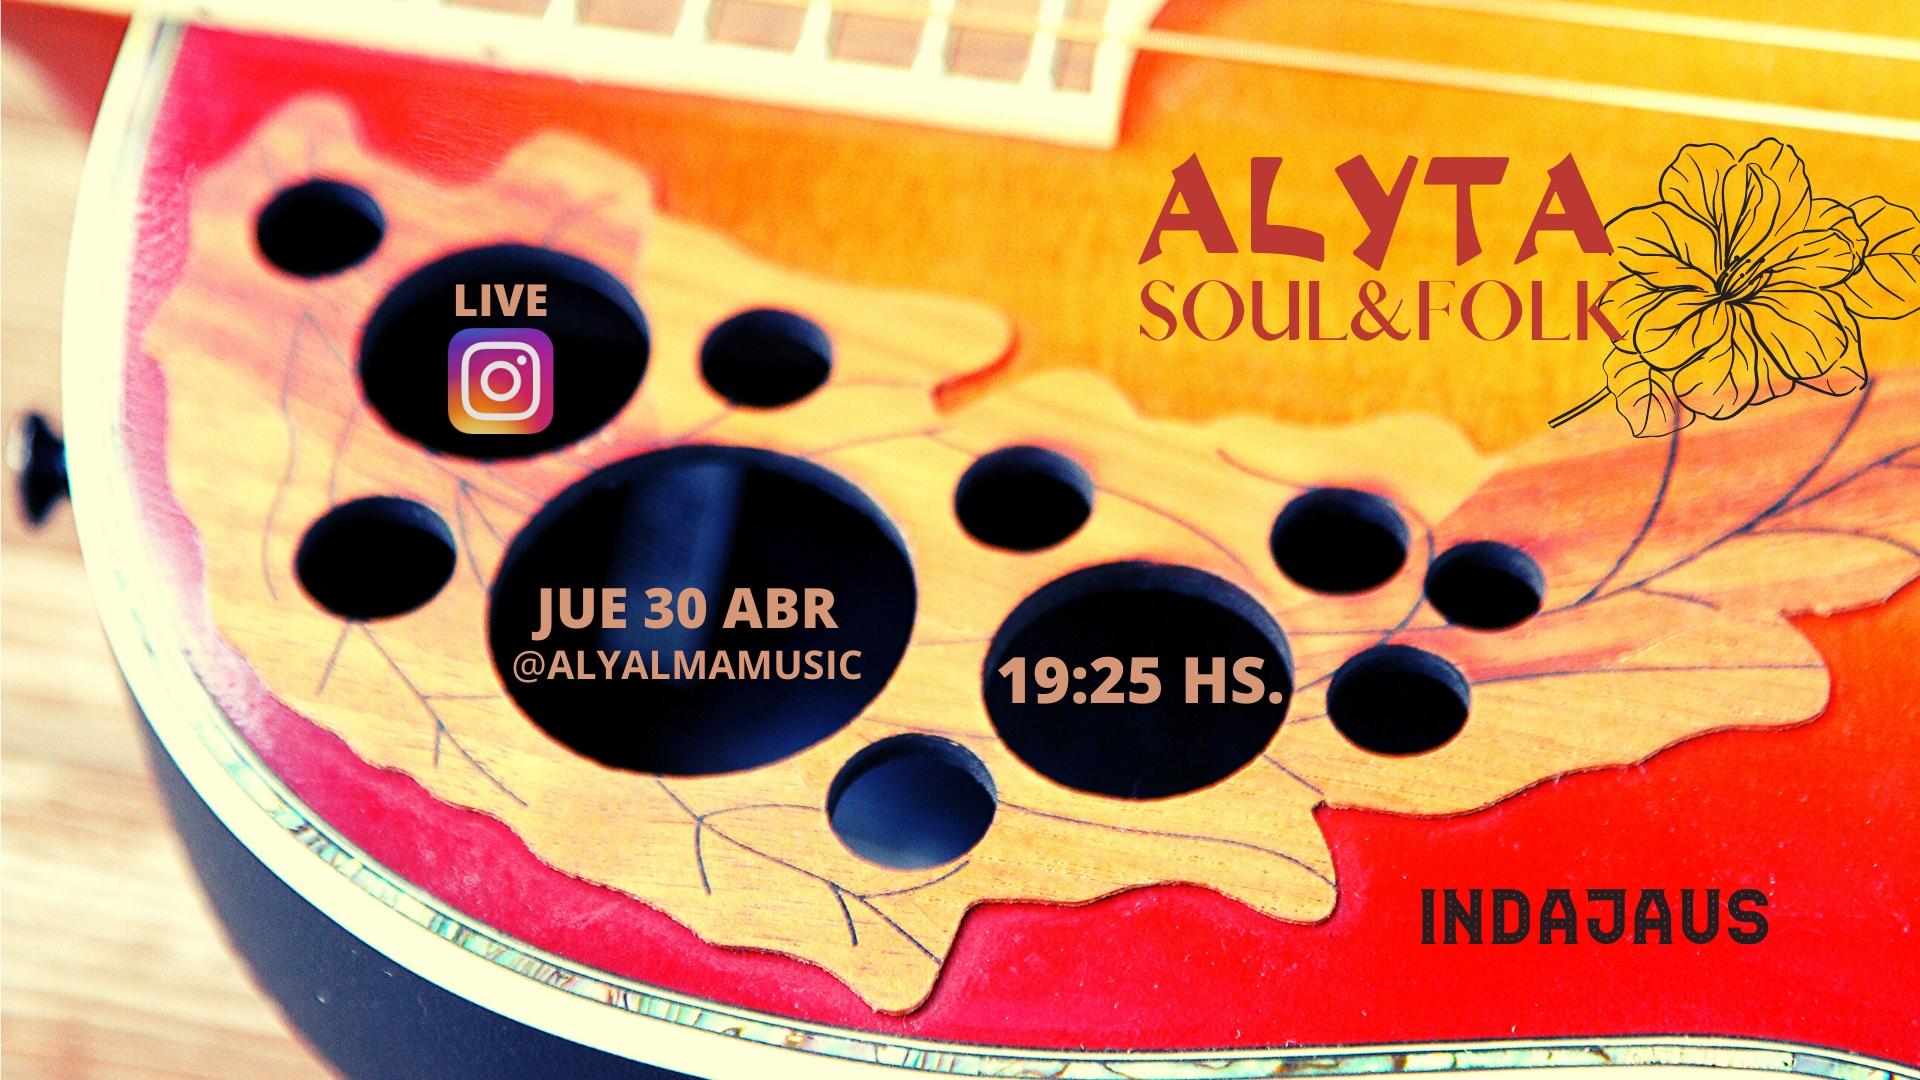 Alyta concert - Aly Alma Music